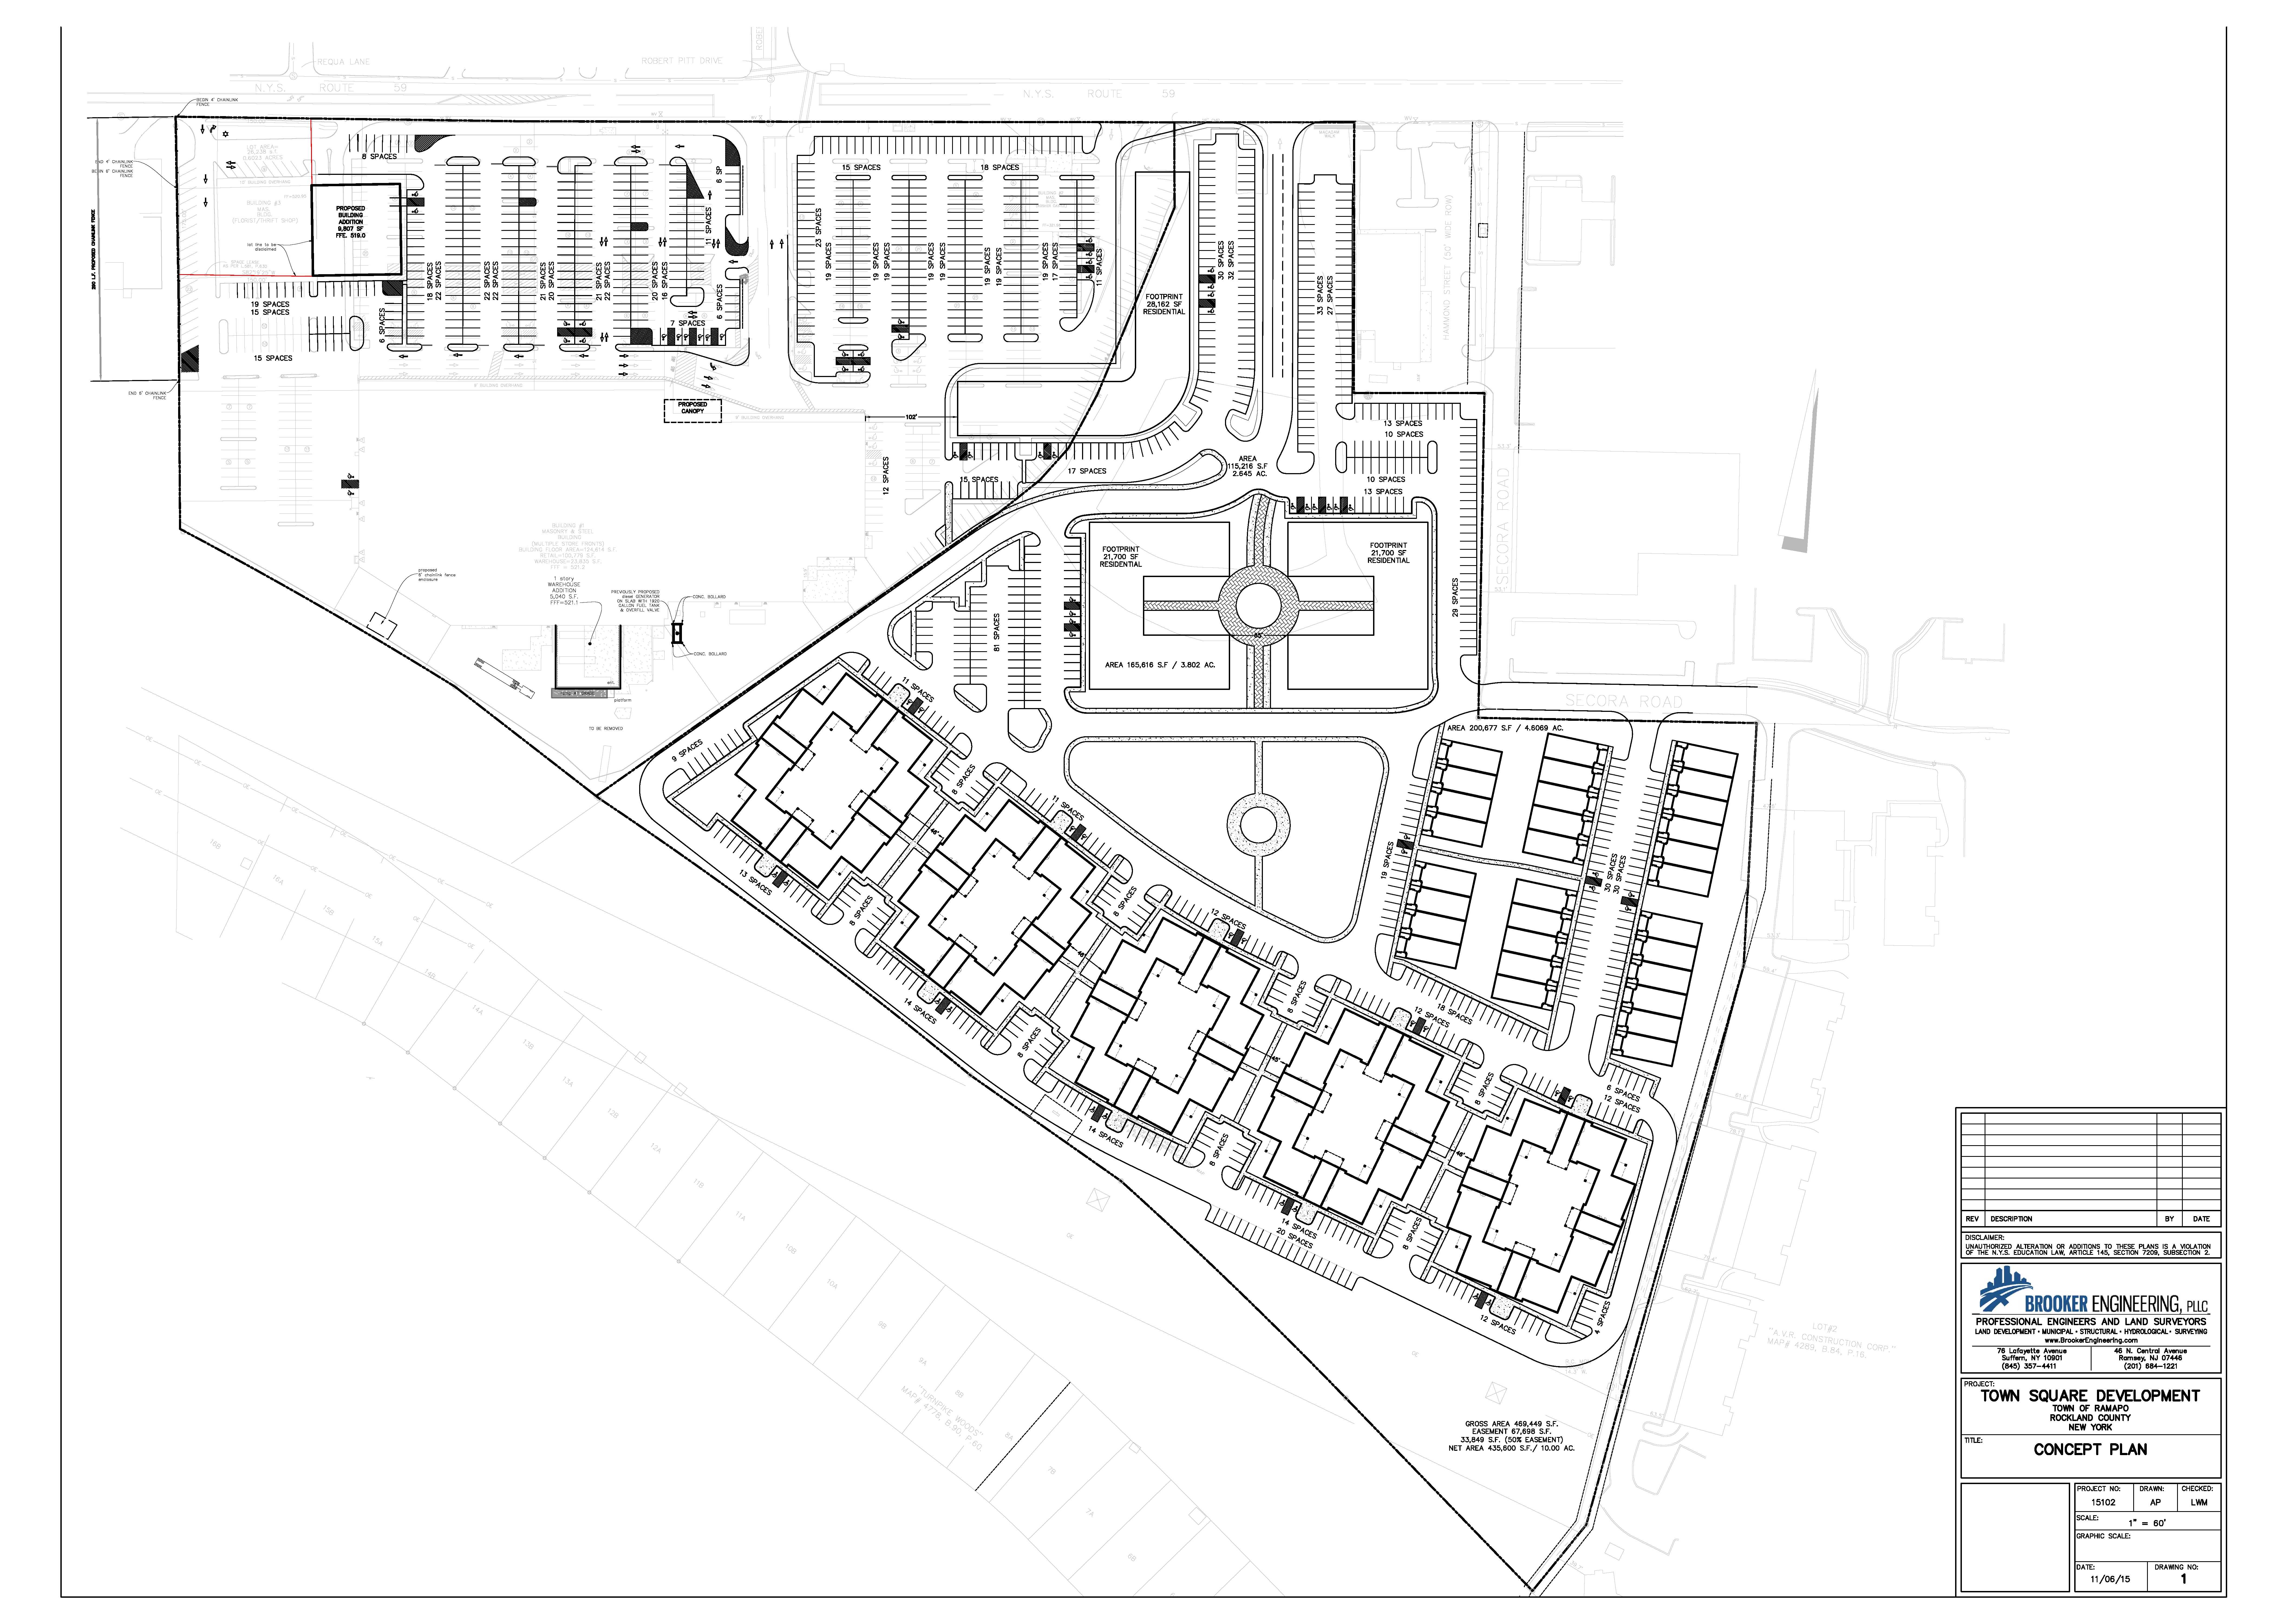 Town Square - Concept 22